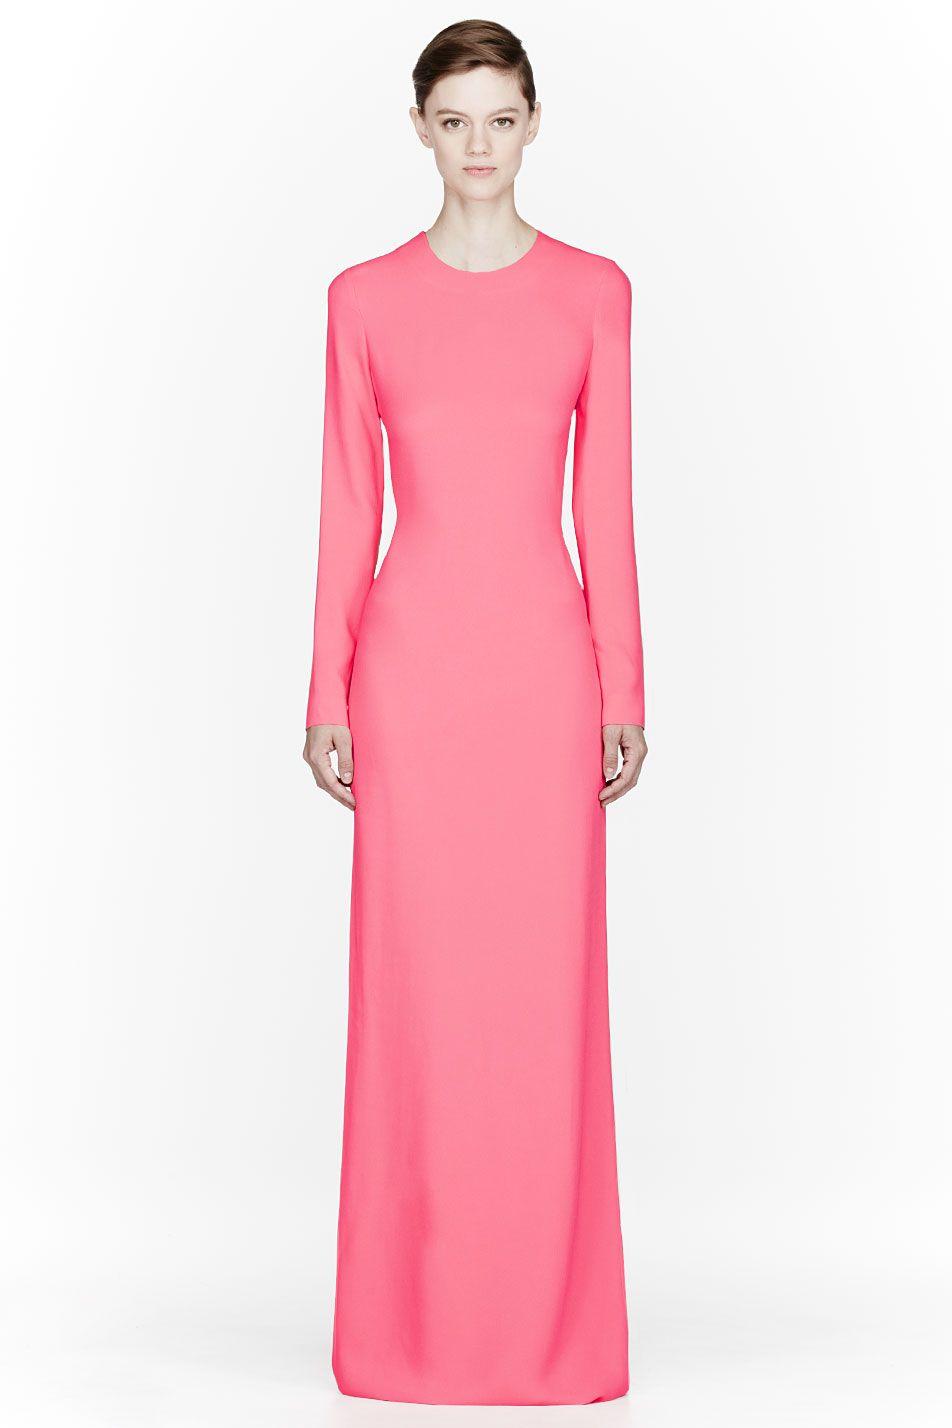 FASHION shopping | Stella Mccartney Cady Pillar Dress, $2,880 | My ...